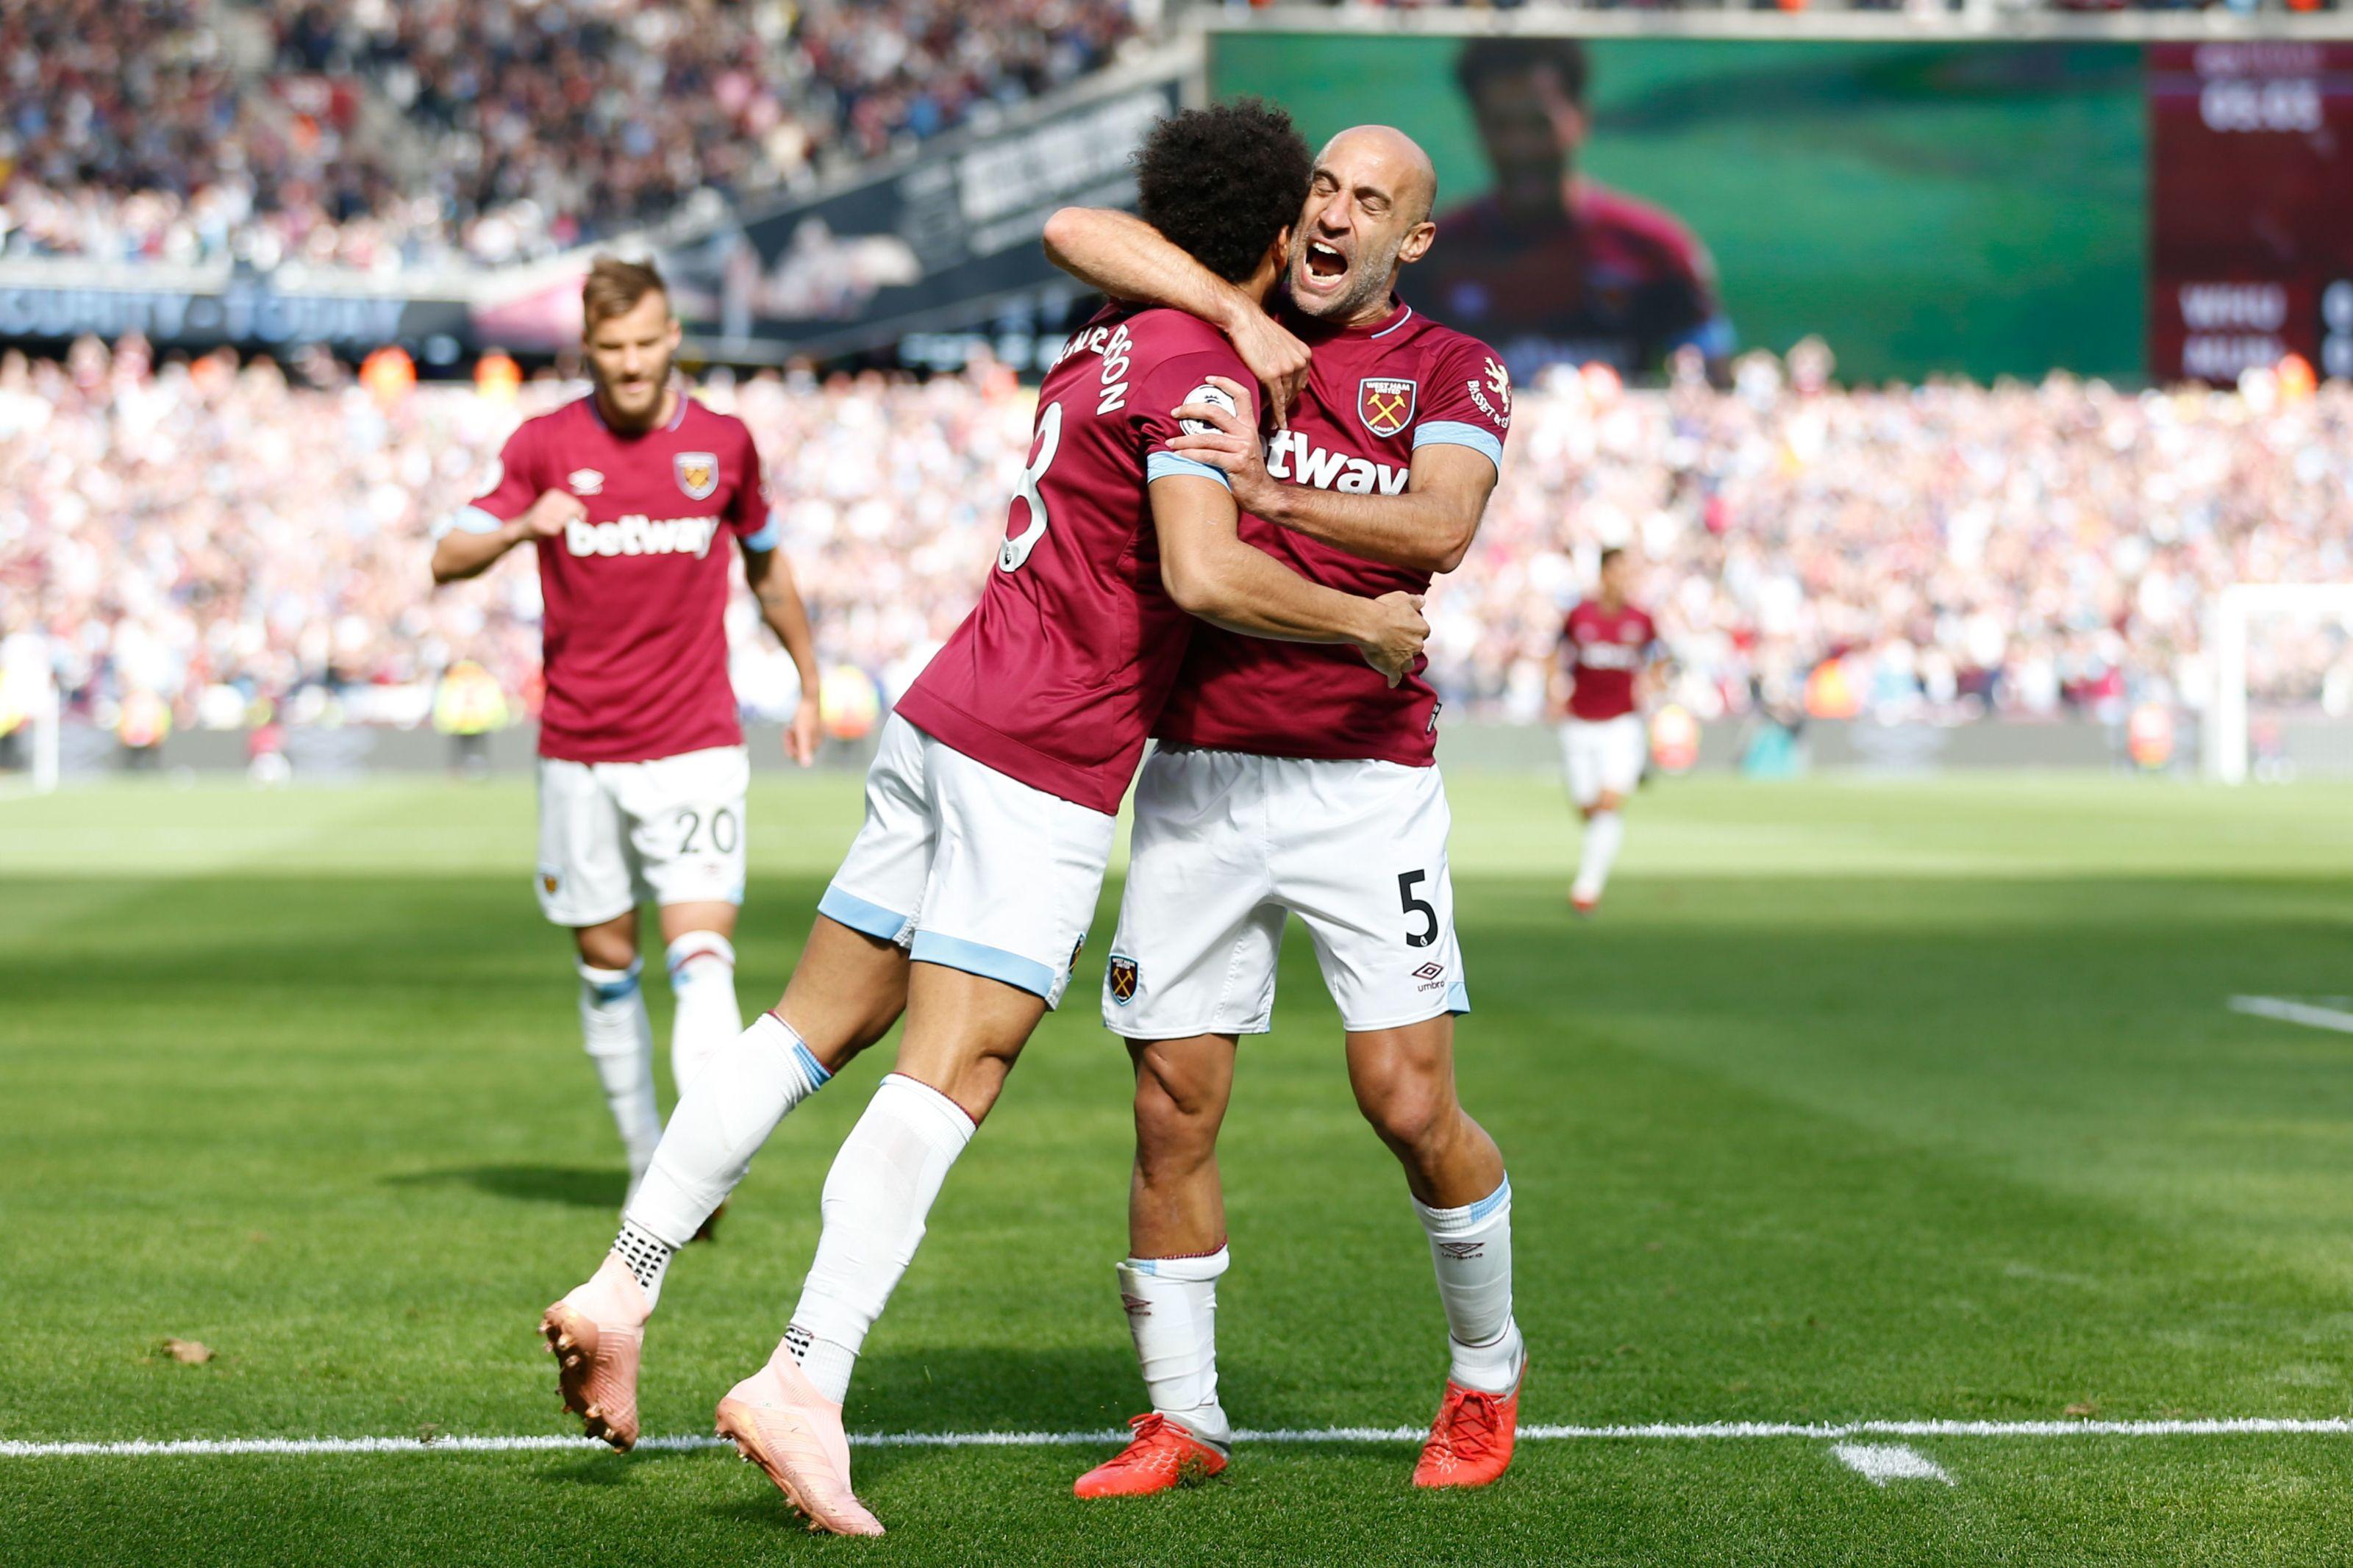 West Ham 3 1 Manchester United Premier League Highlights And Recap